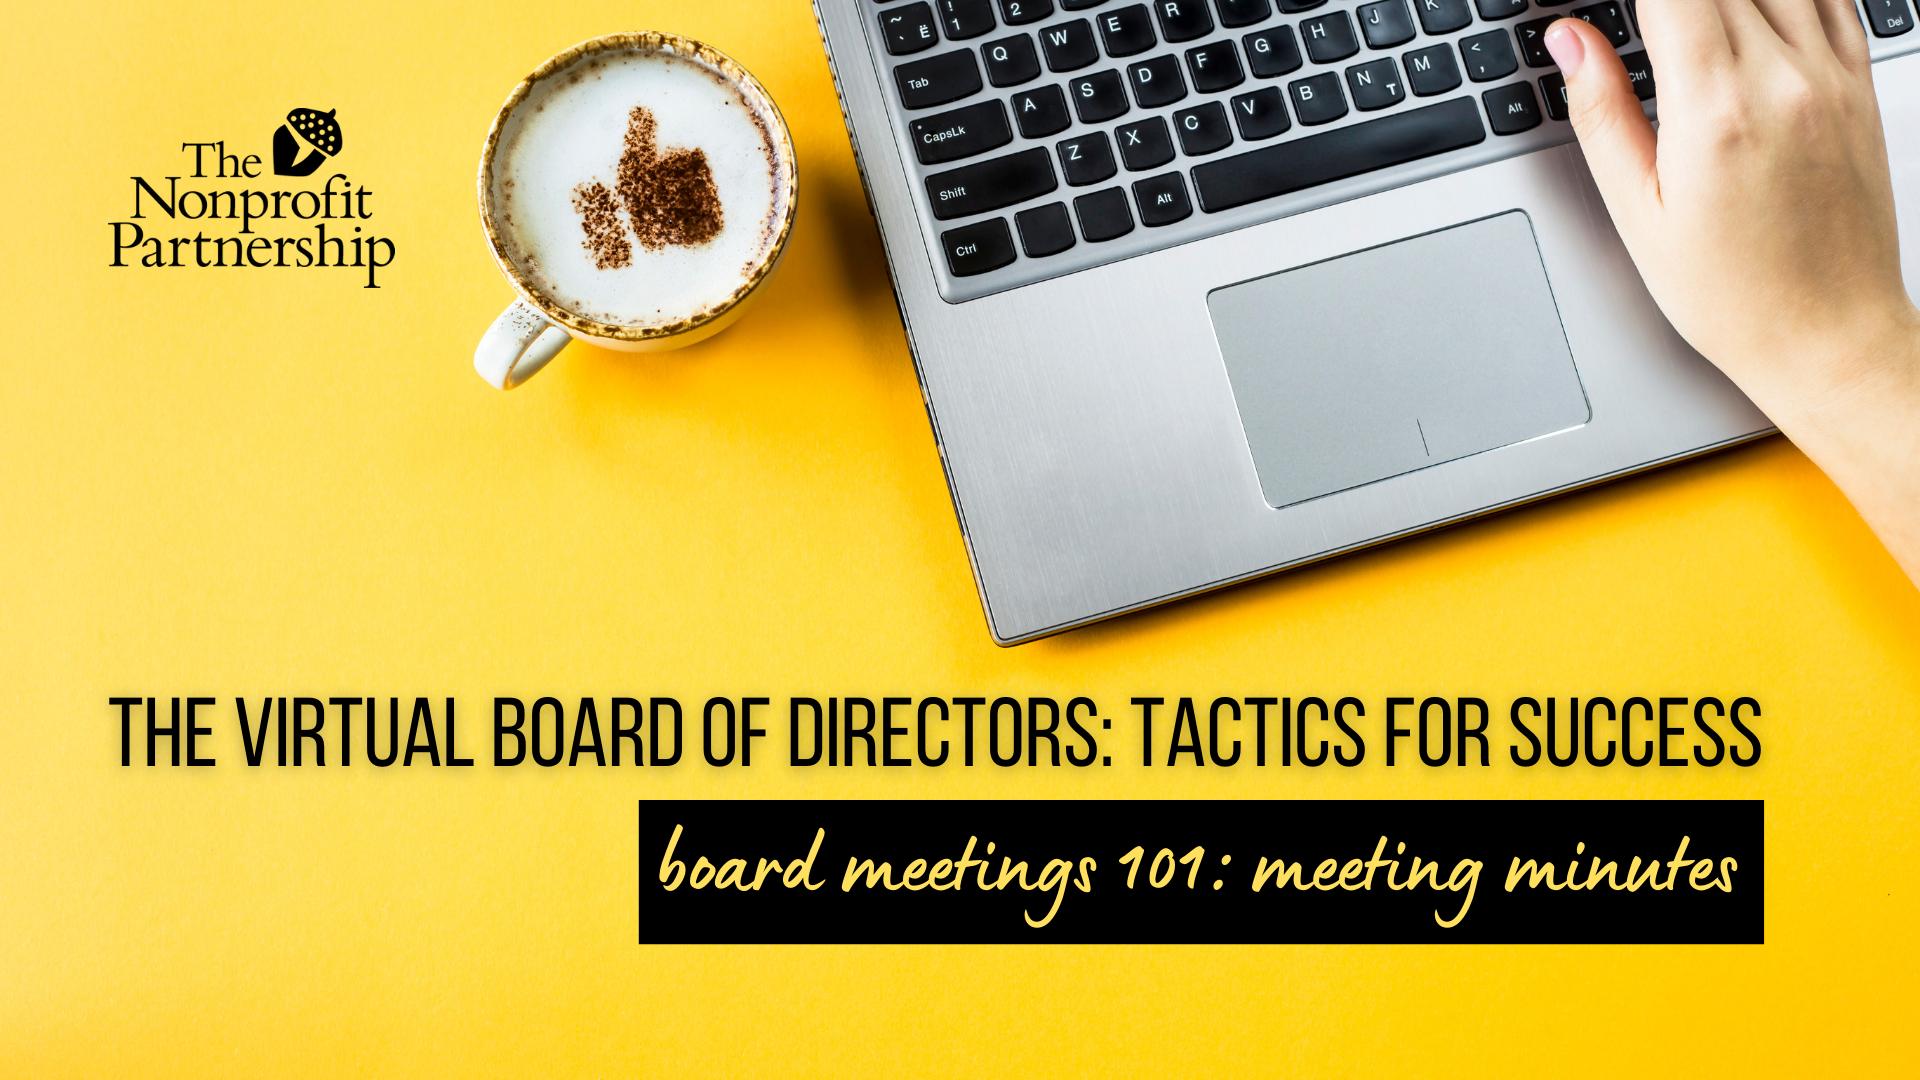 [Zoom Meeting] The Virtual Board of Directors: Tactics for Success - Board Meetings 101: Meeting Minutes